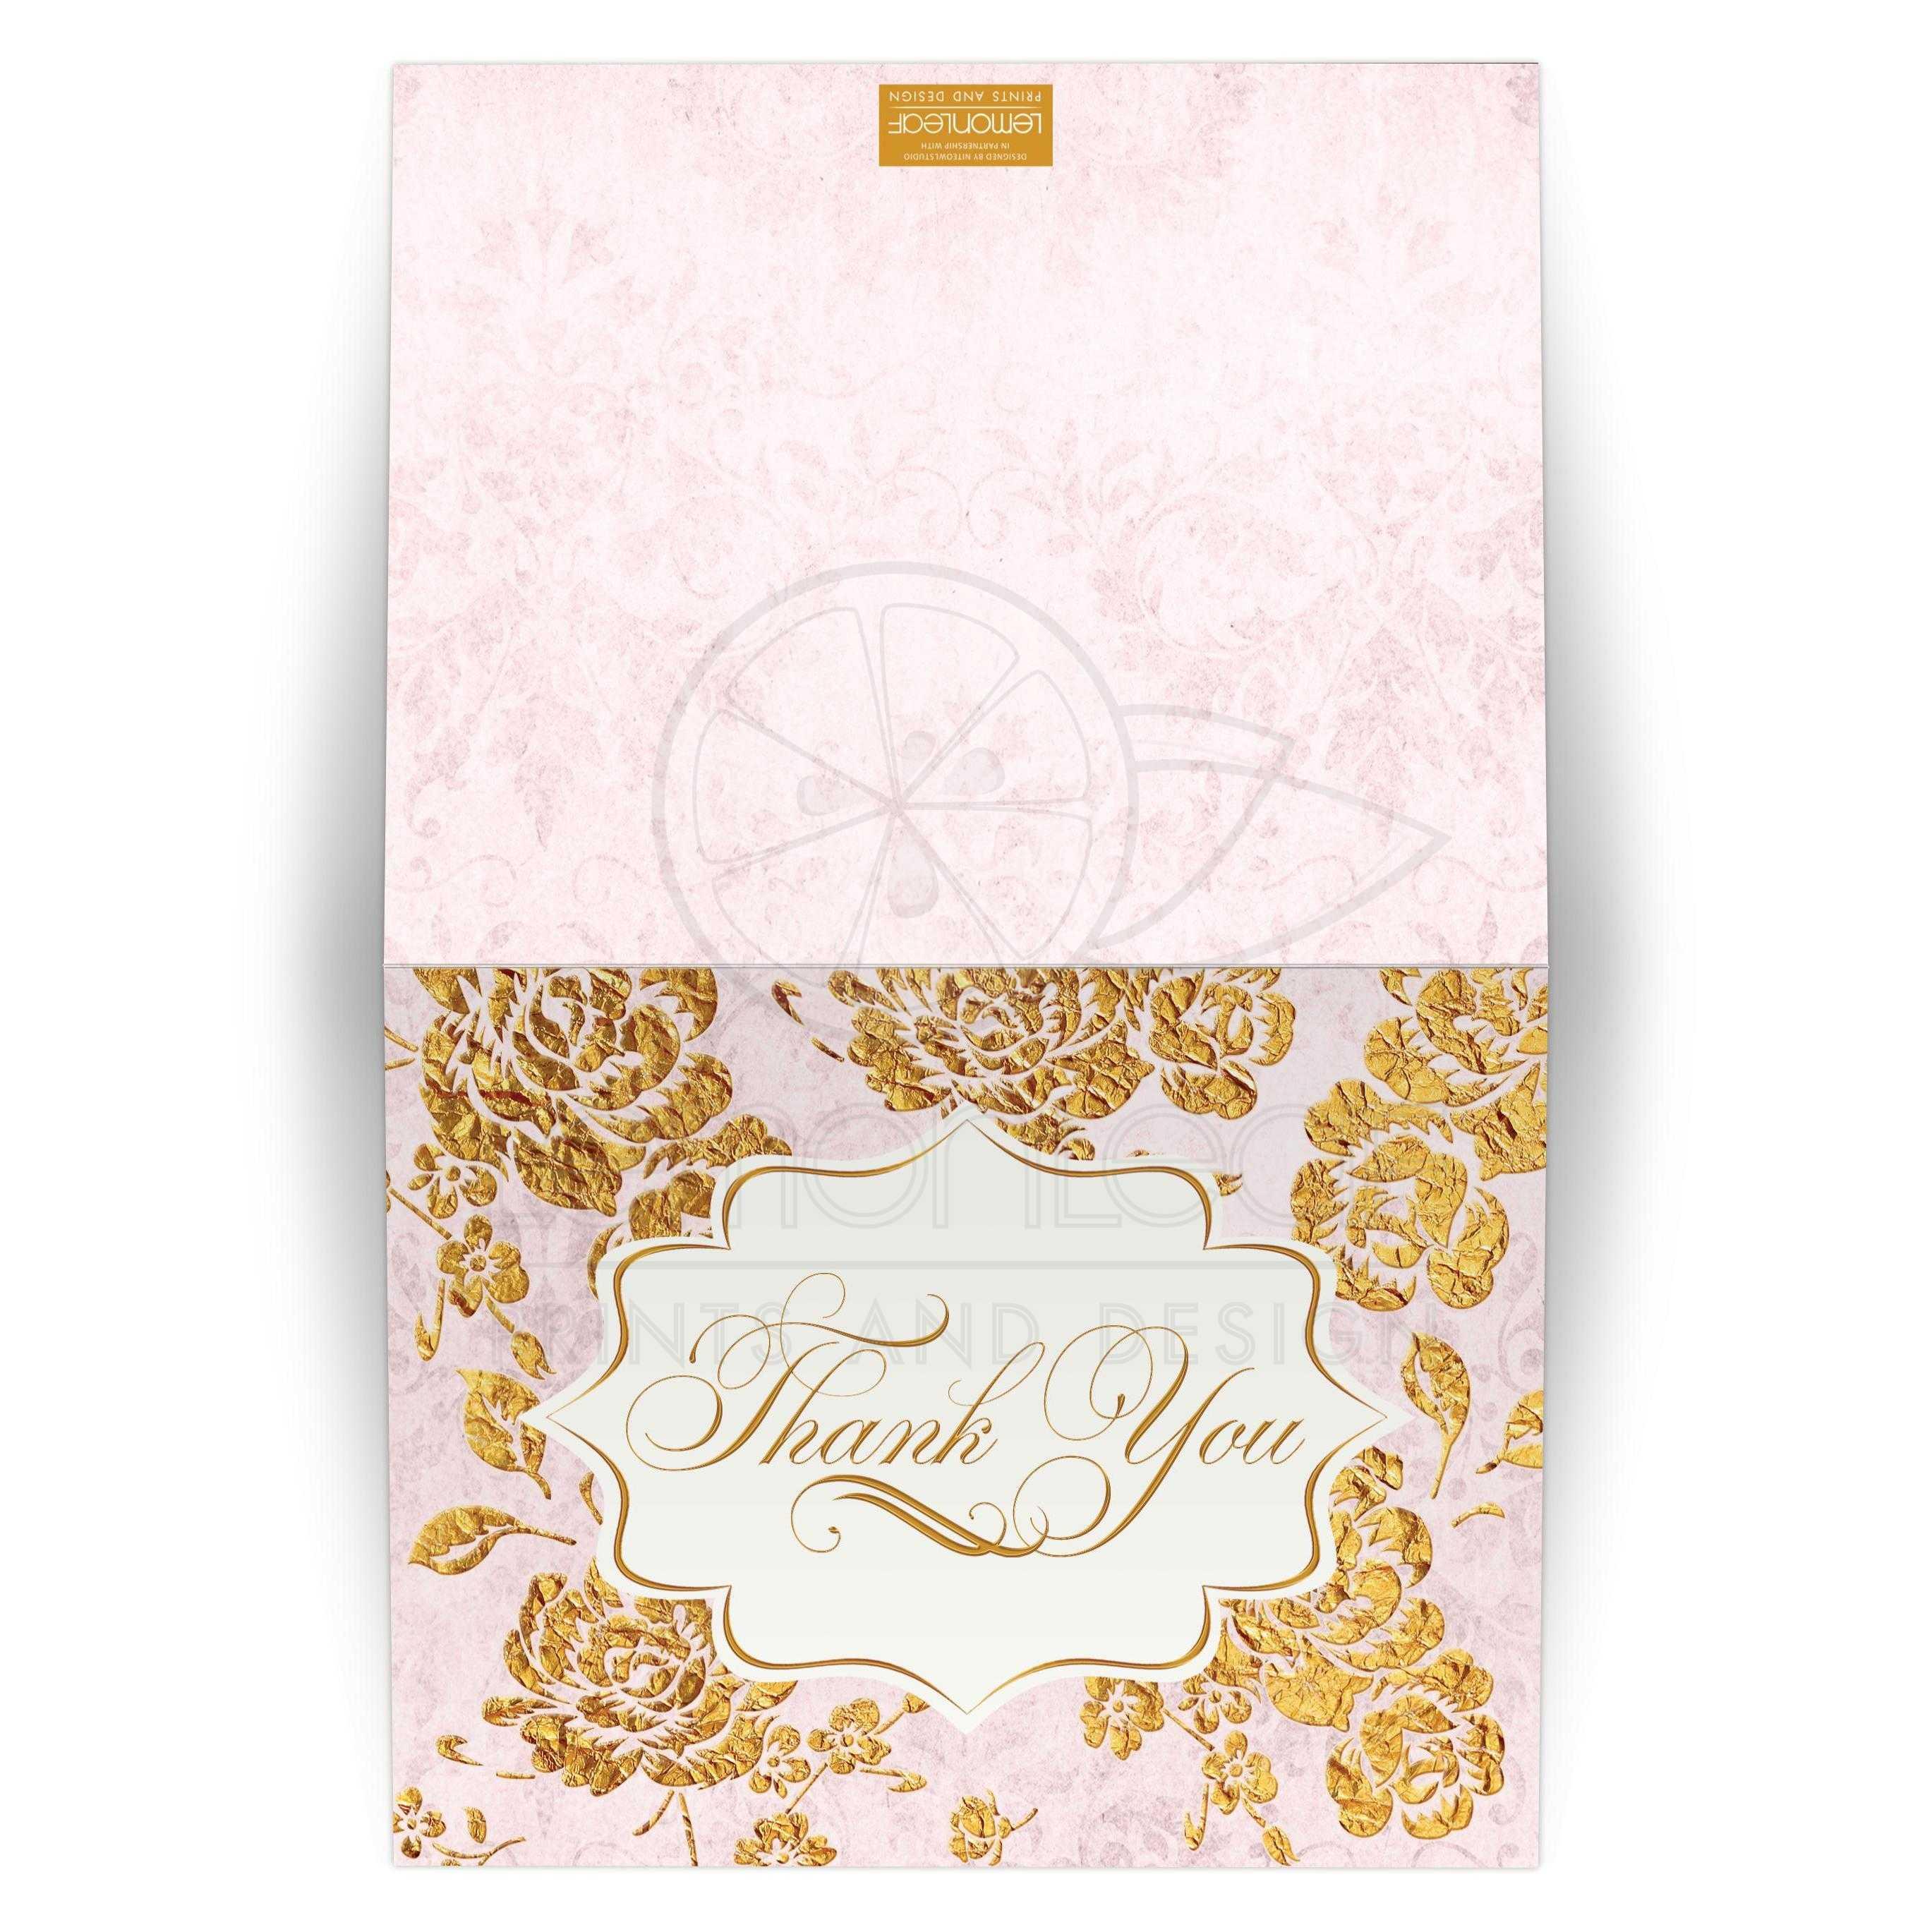 Wedding Thank You Card - BLANK | Vintage Floral | Blush Pink, Ivory ...